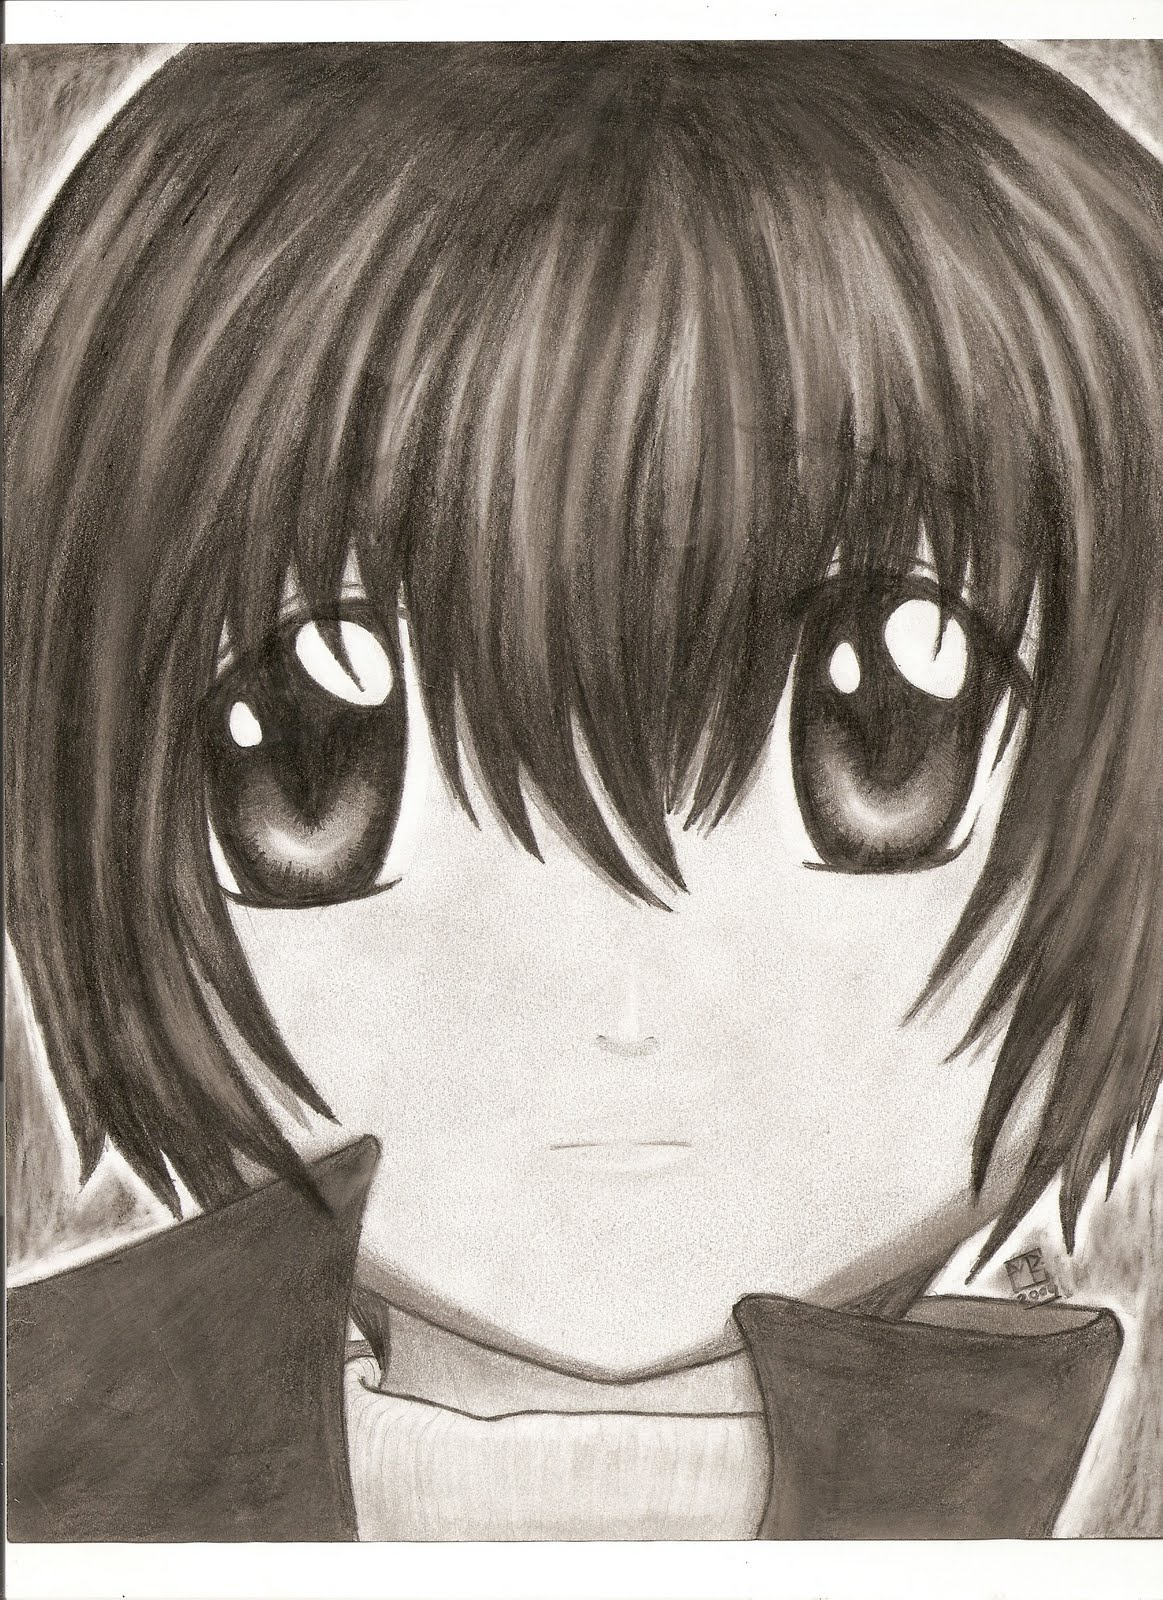 http://2.bp.blogspot.com/_H5oqxS6gj_4/S_sNyaq_O1I/AAAAAAAAACo/nFLI_0P2oXU/s1600/ni%C3%B1o__boy_anime_lapiz_a_mano.jpg